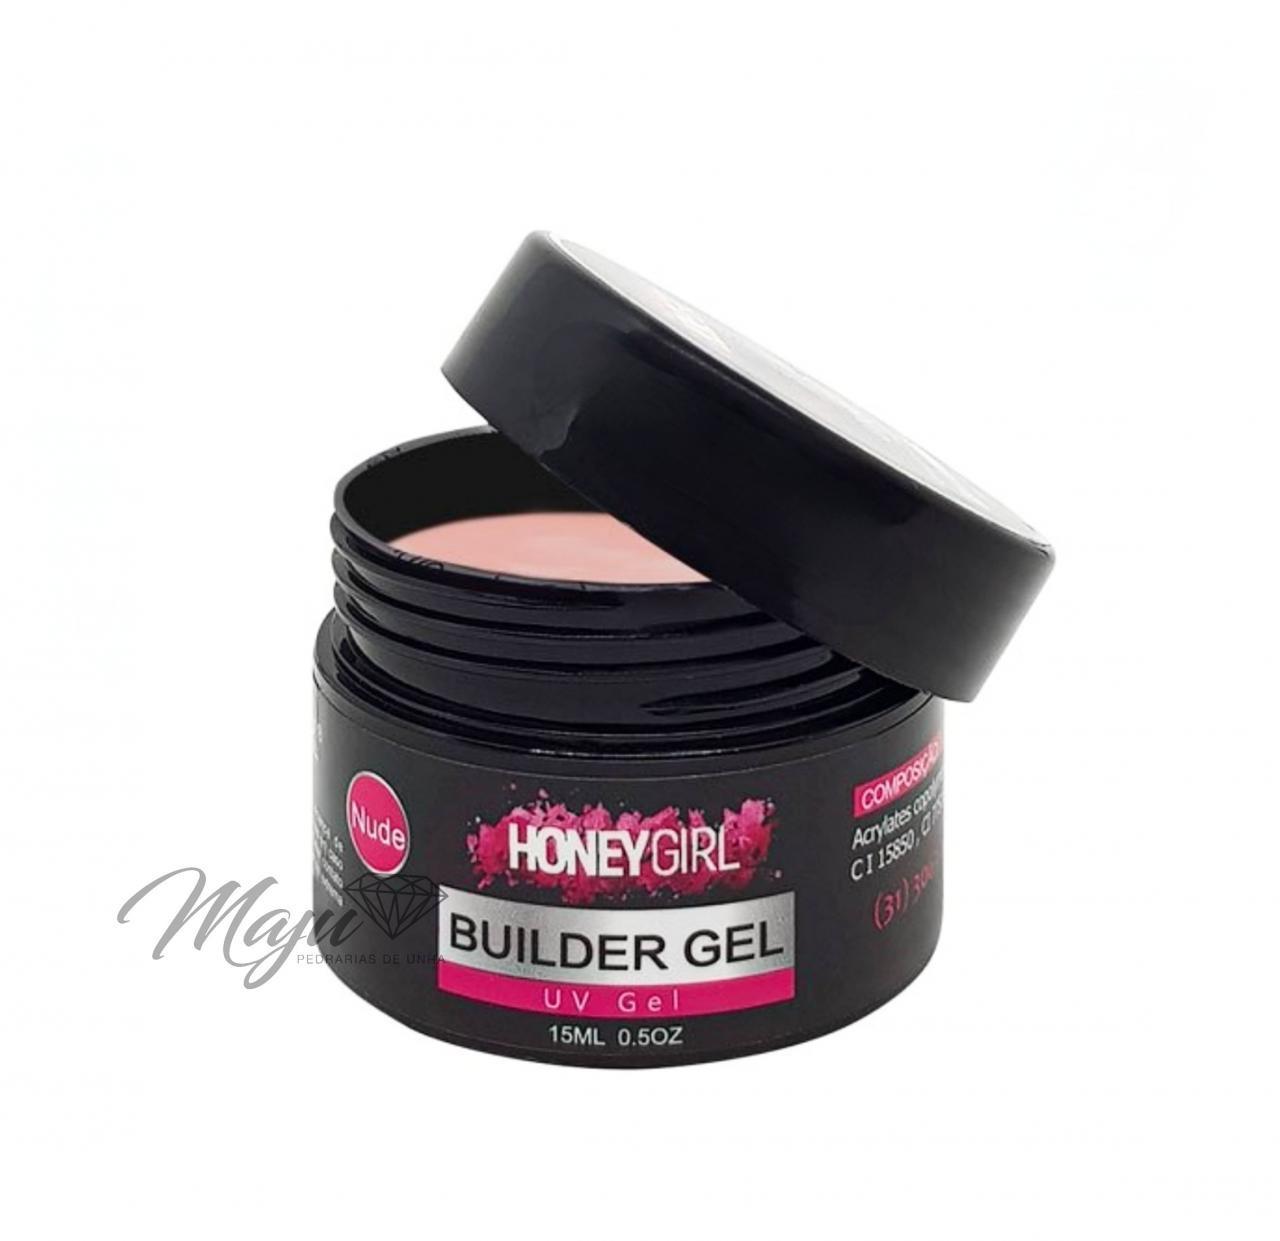 GEL HONEY GIRL BUILDER 15ML. NUDE